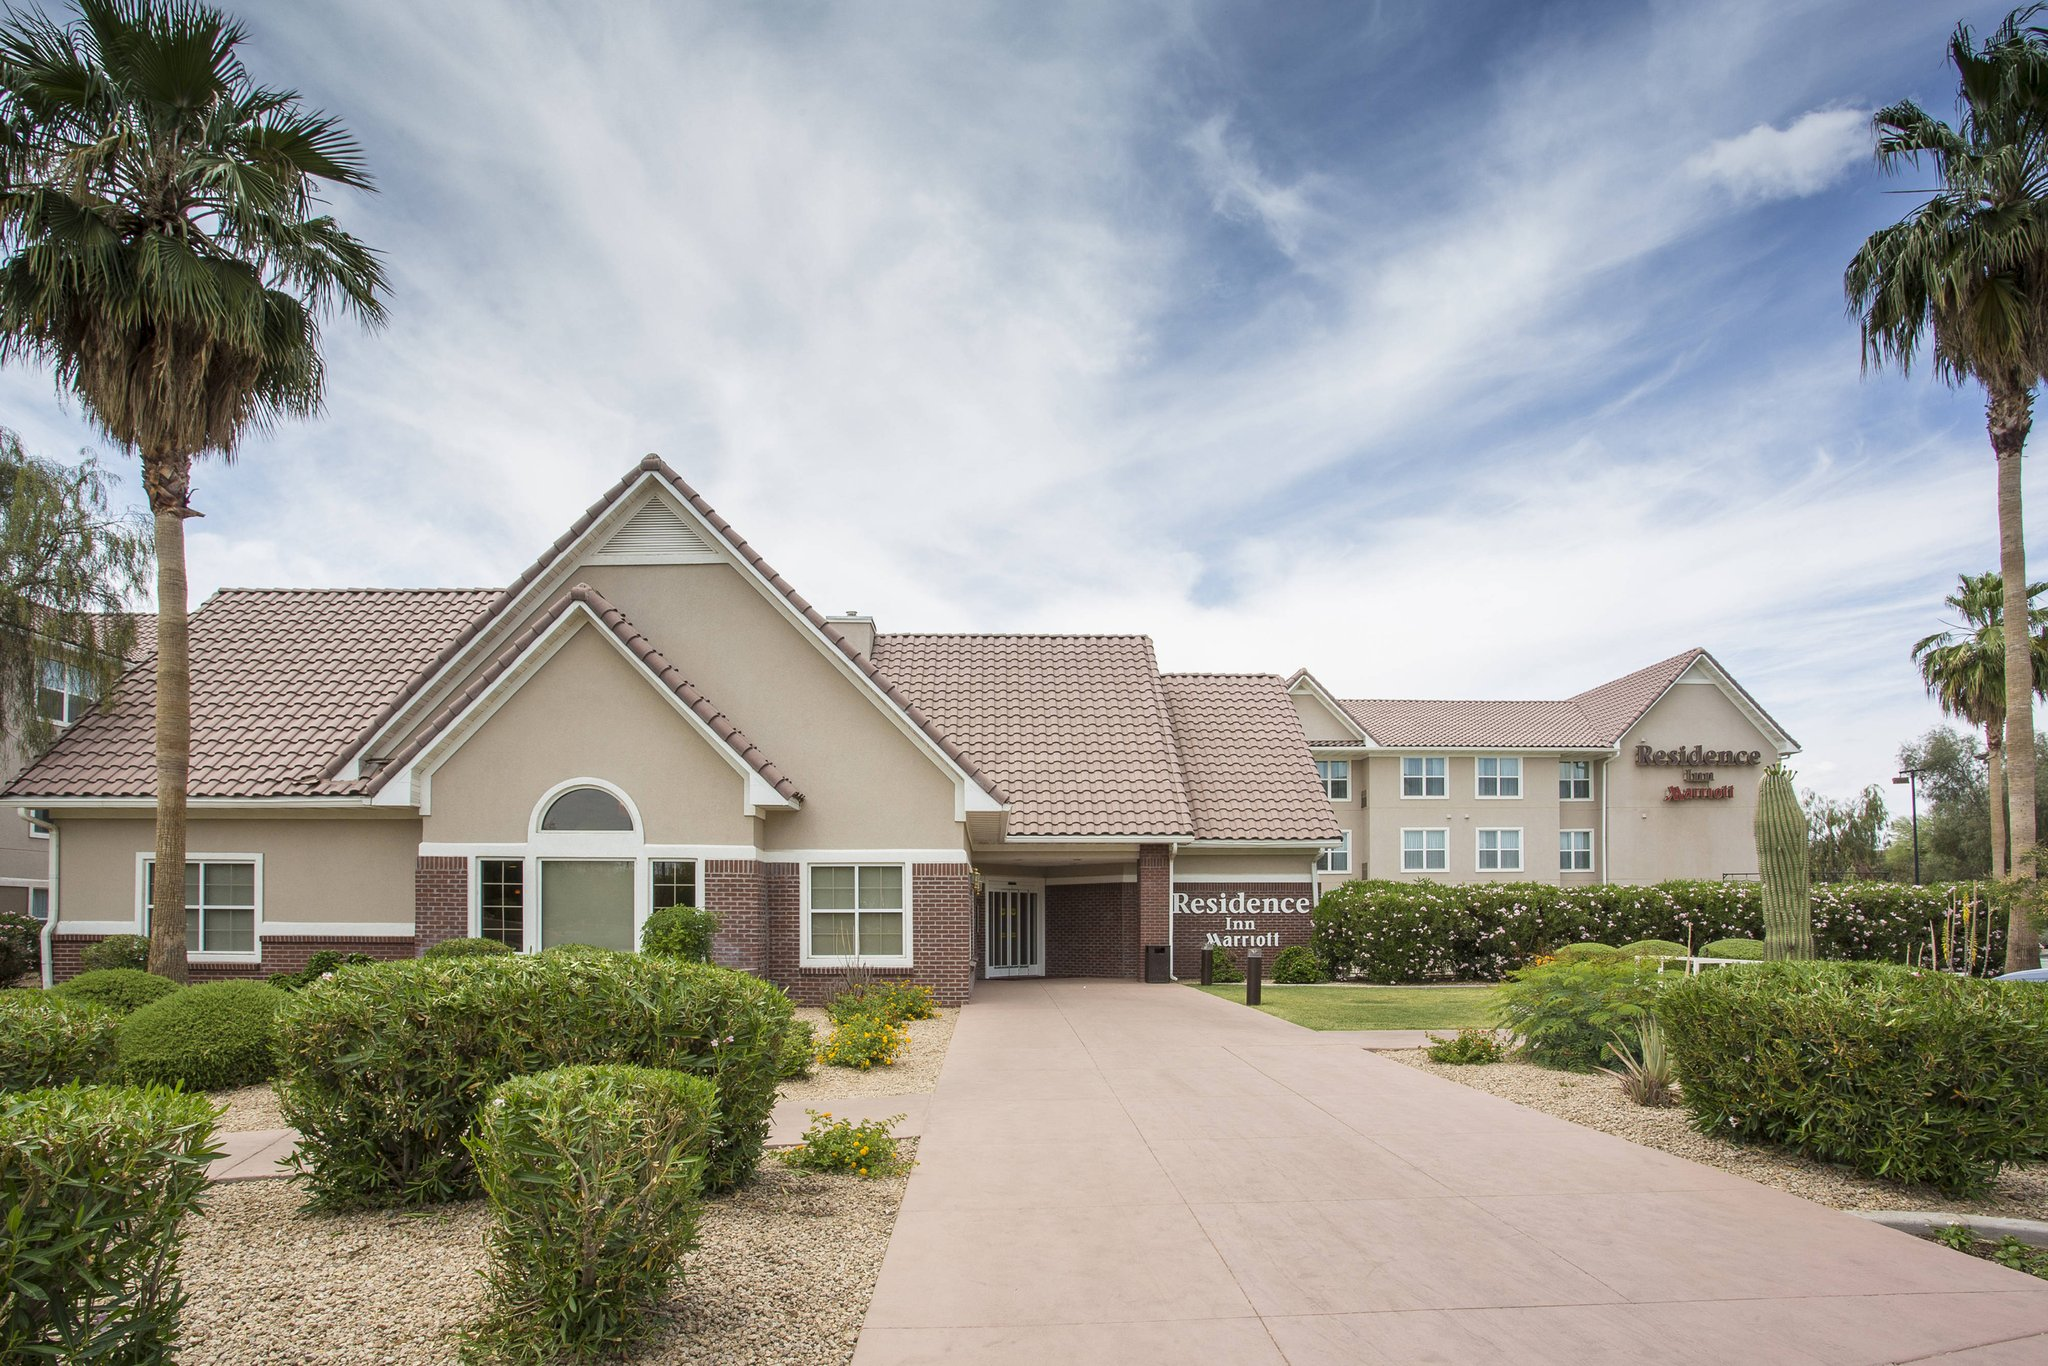 Residence Inn Phoenix Glendale/Peoria